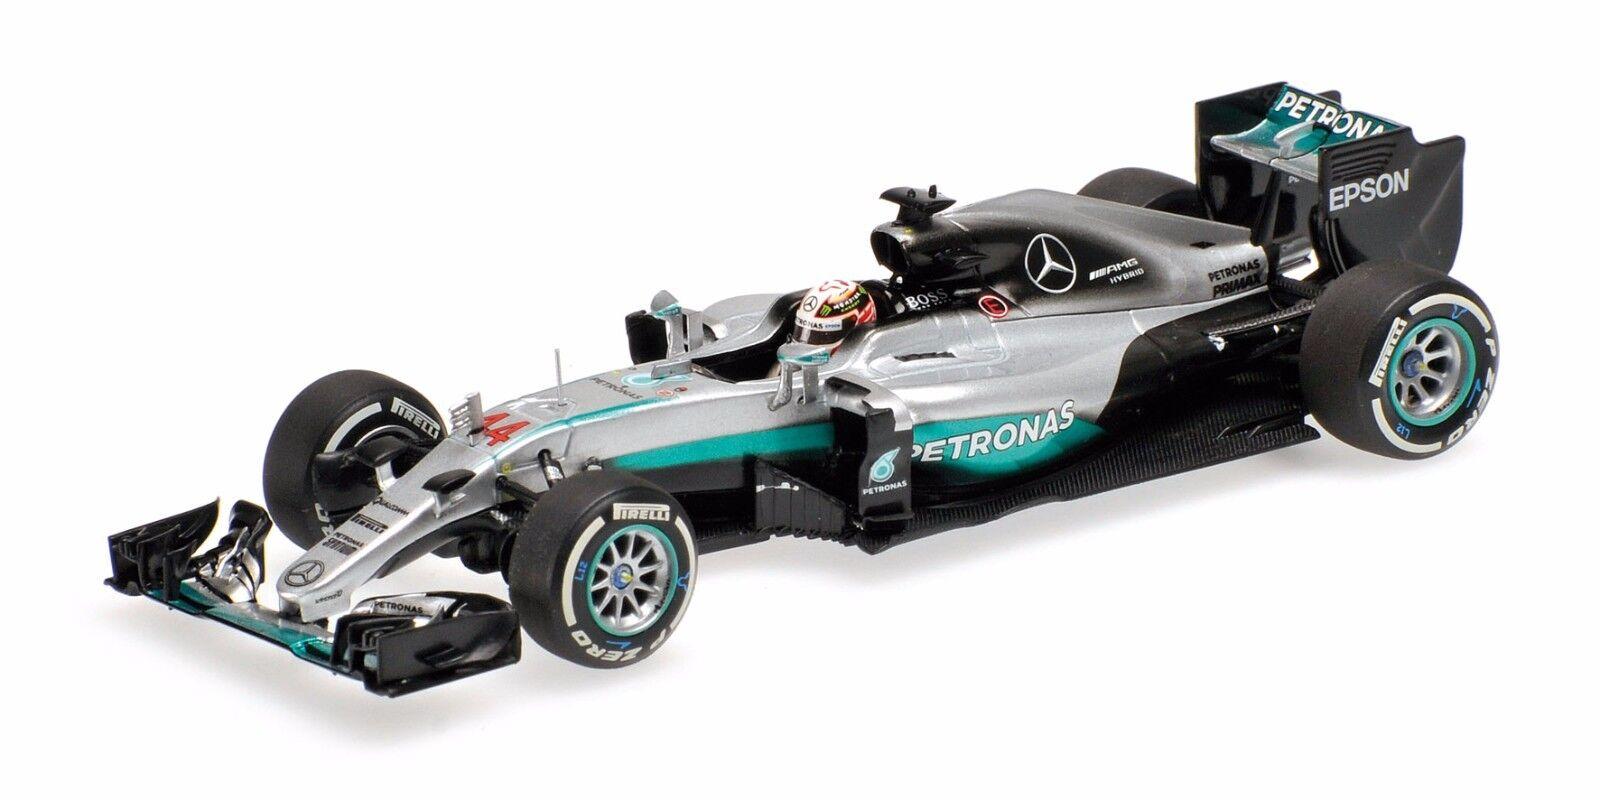 Mercedes AMG F1 W07 Hybrid Hamilton 2016 410160044 Minichamps 1 43 NEW in a Box